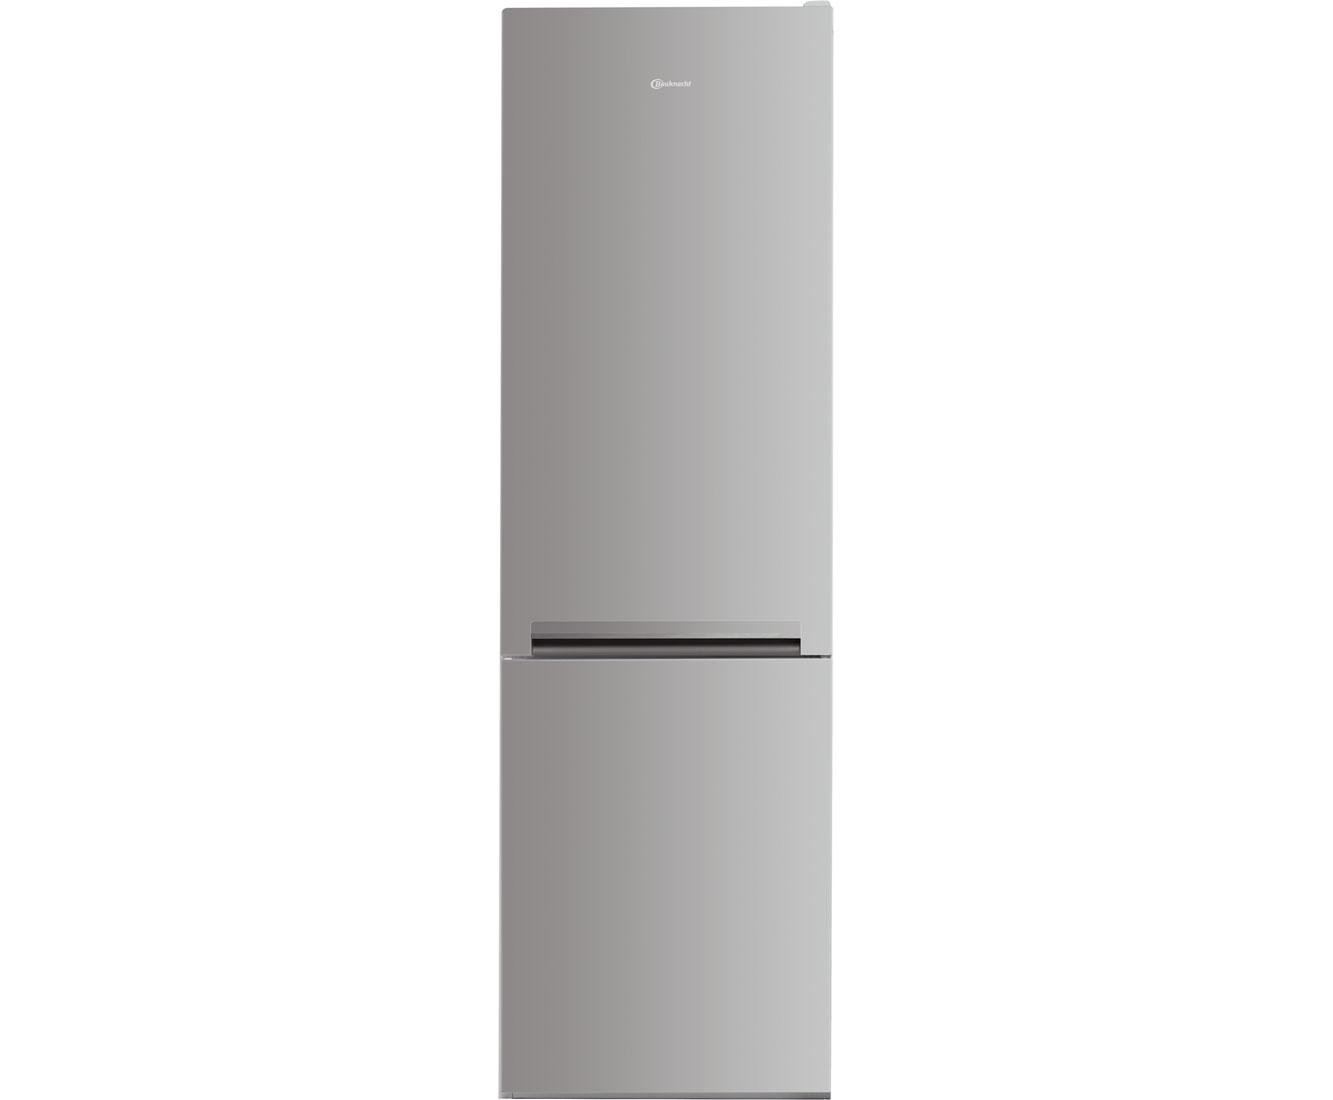 Bomann Kühlschrank Dt 248 : Rabatt preisvergleich.de küche u003e kühlen gefrieren u003e kühl